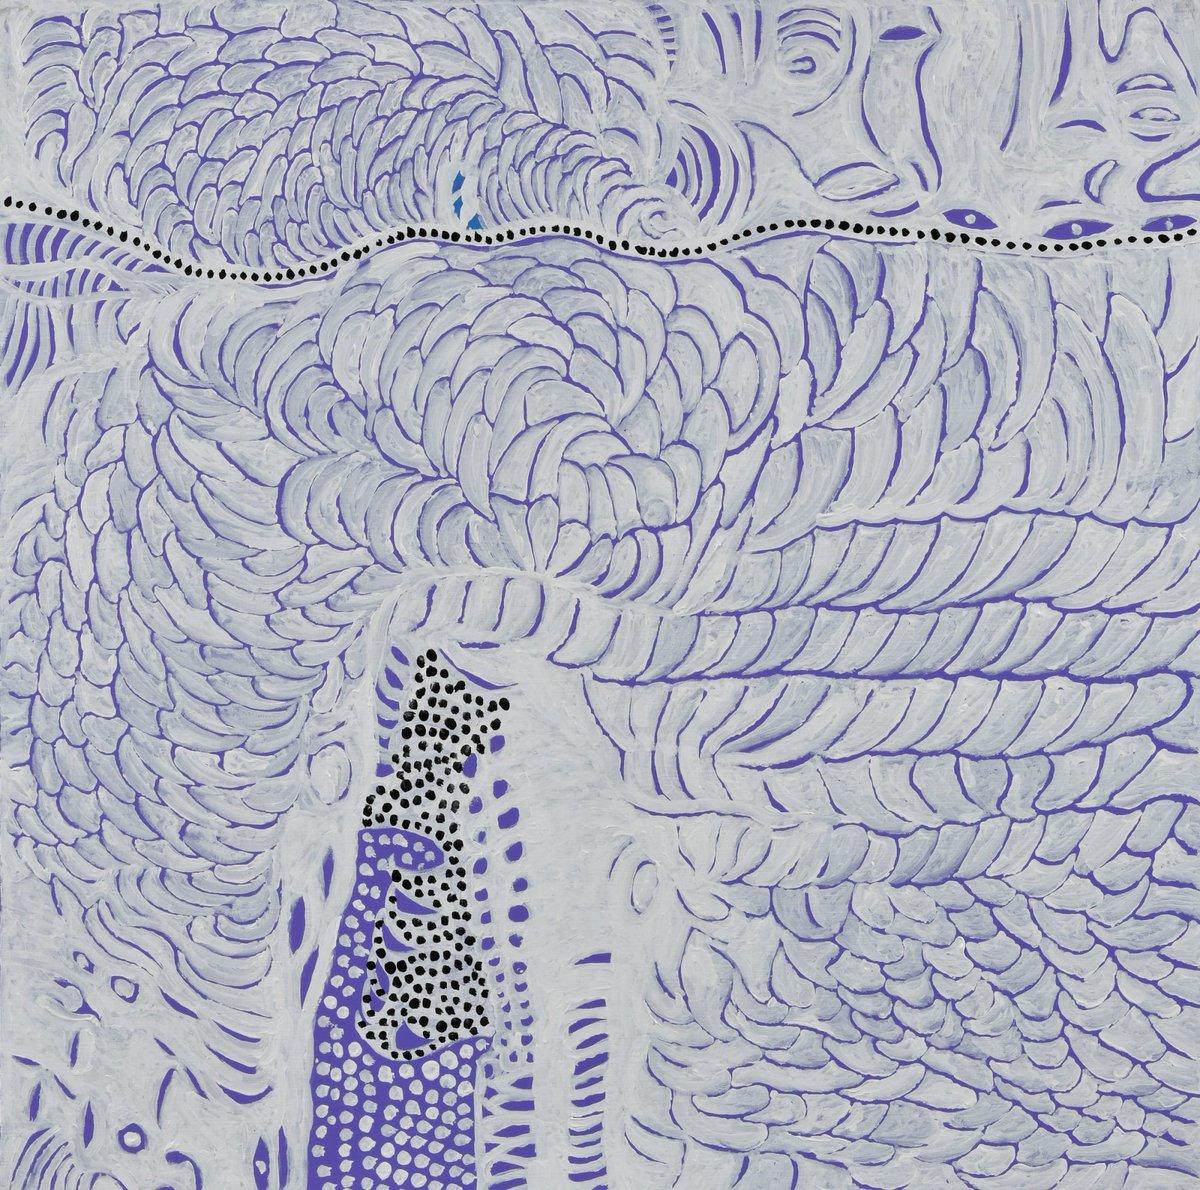 "FASHIONSNAP.COM on Twitter: ""草間彌生美術館が、展覧会「我々の見たこともない幻想の幻とはこの素晴らしさである」を開催。幻覚や内面世界のヴィジョンを作品化した初公開作品のみを展示。 https://t.co/bwMVZWMU6N… """